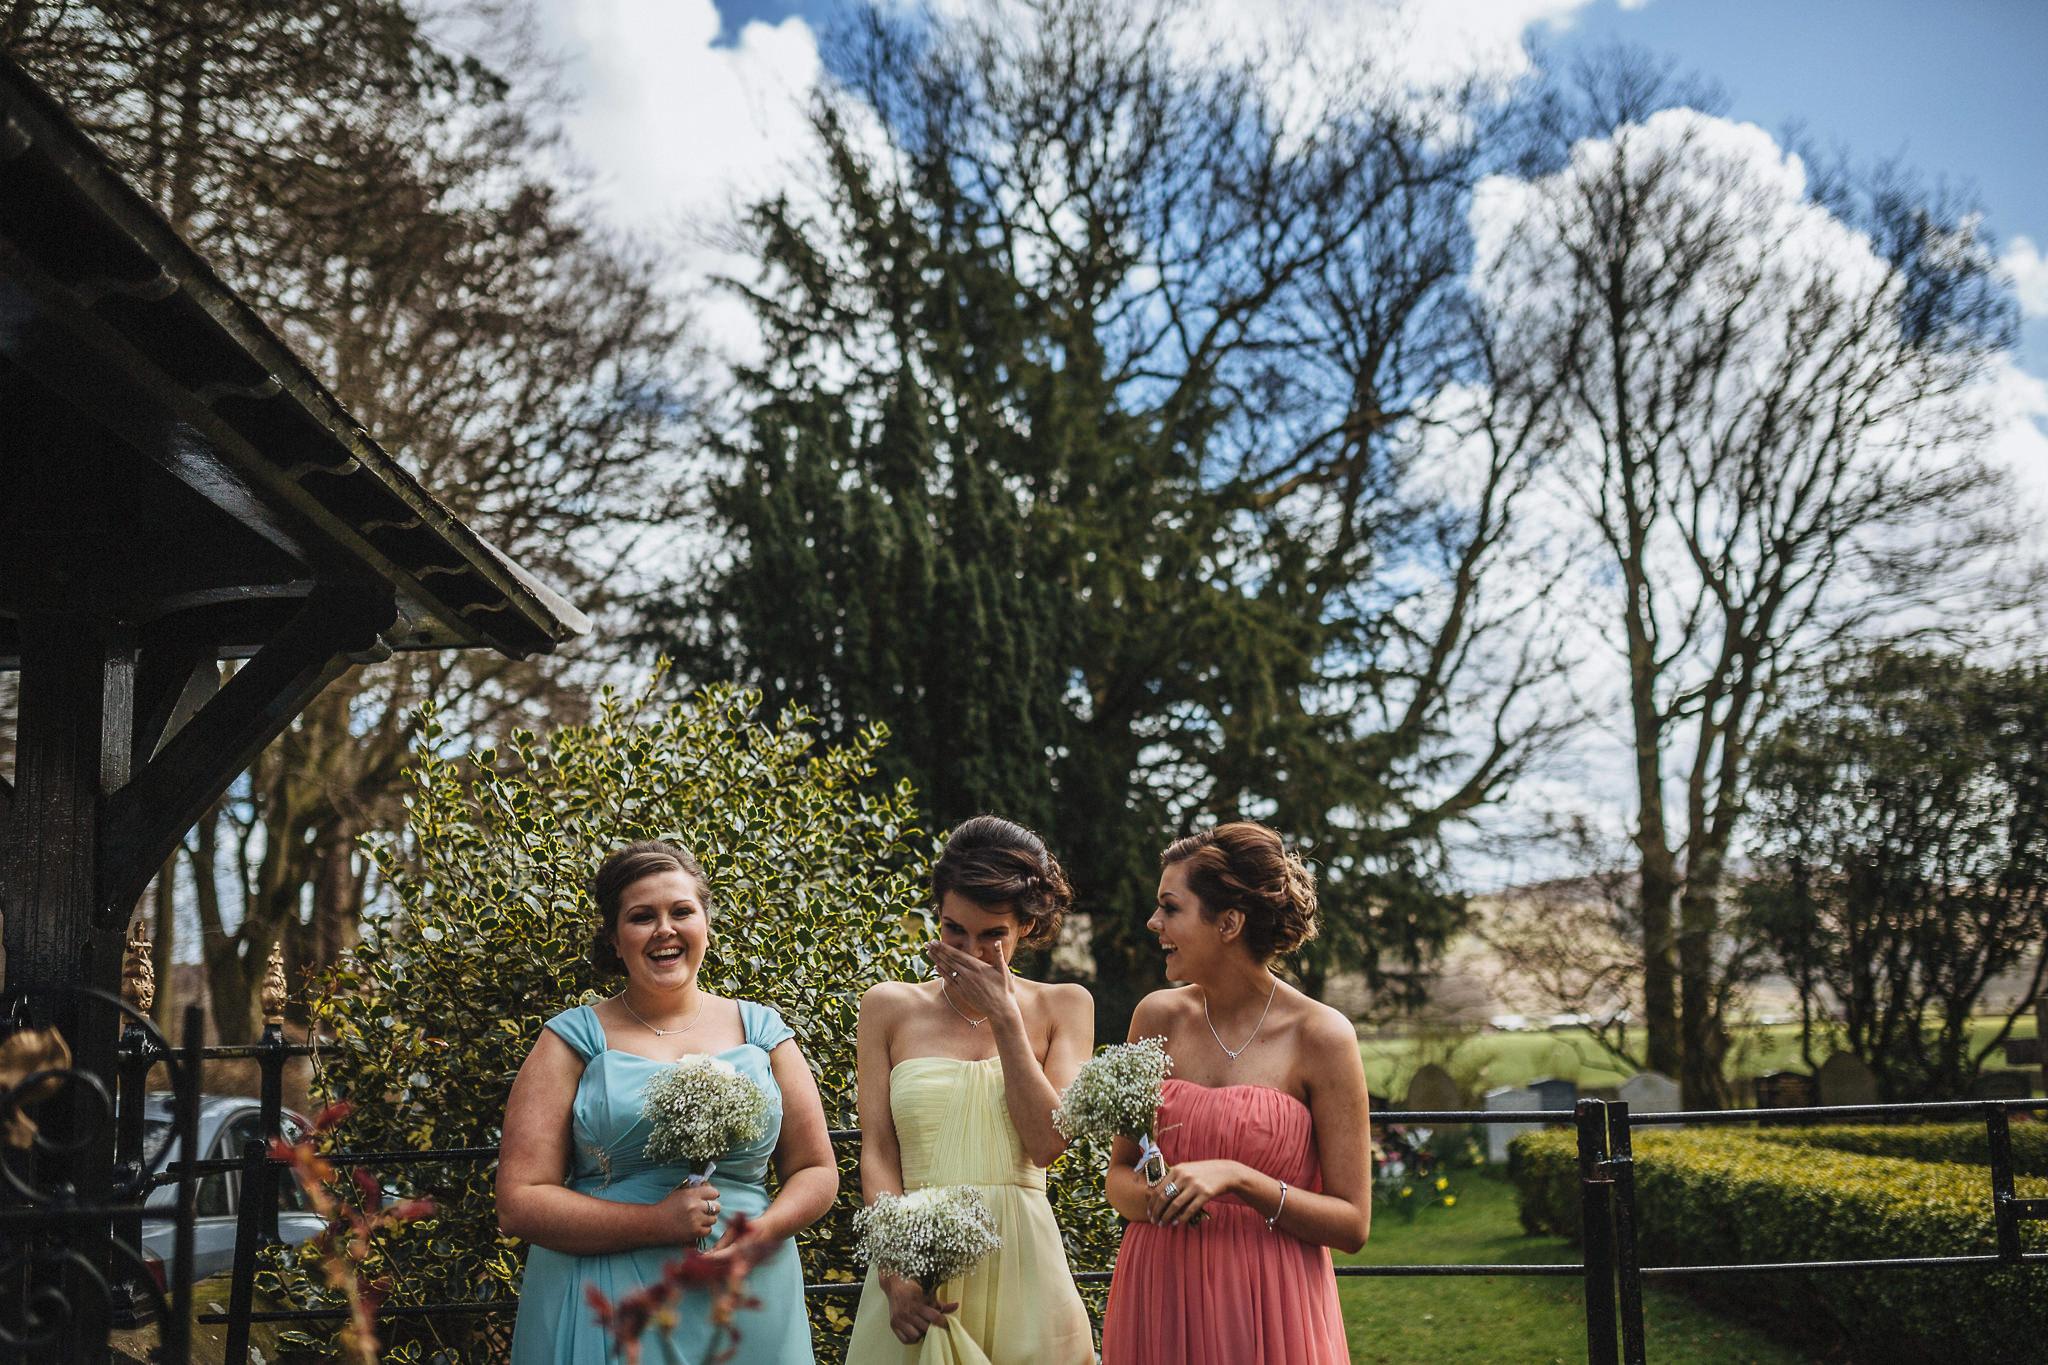 Lancashire-Creative-natural-documentary-wedding-photography-90023